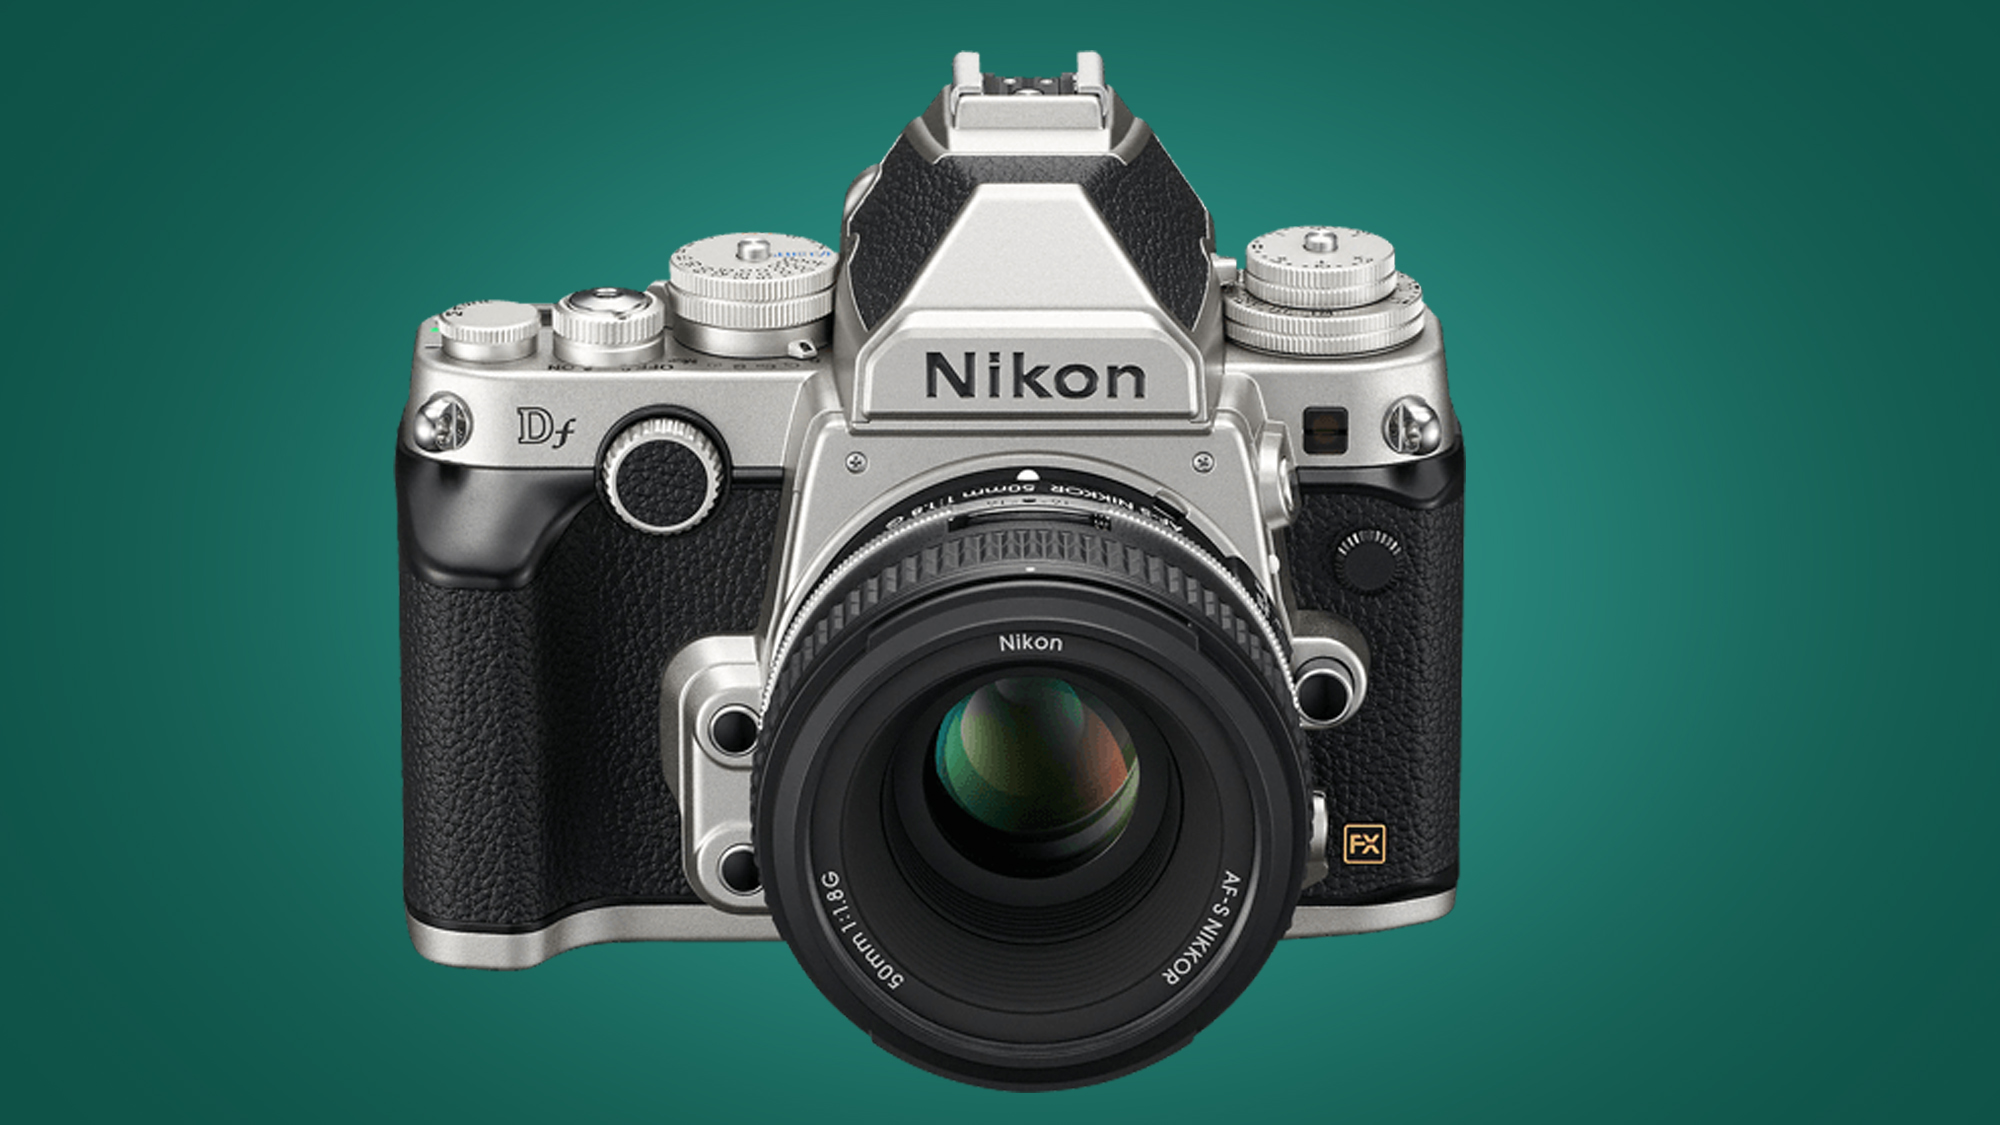 Image showing front of Nikon Df DSLR